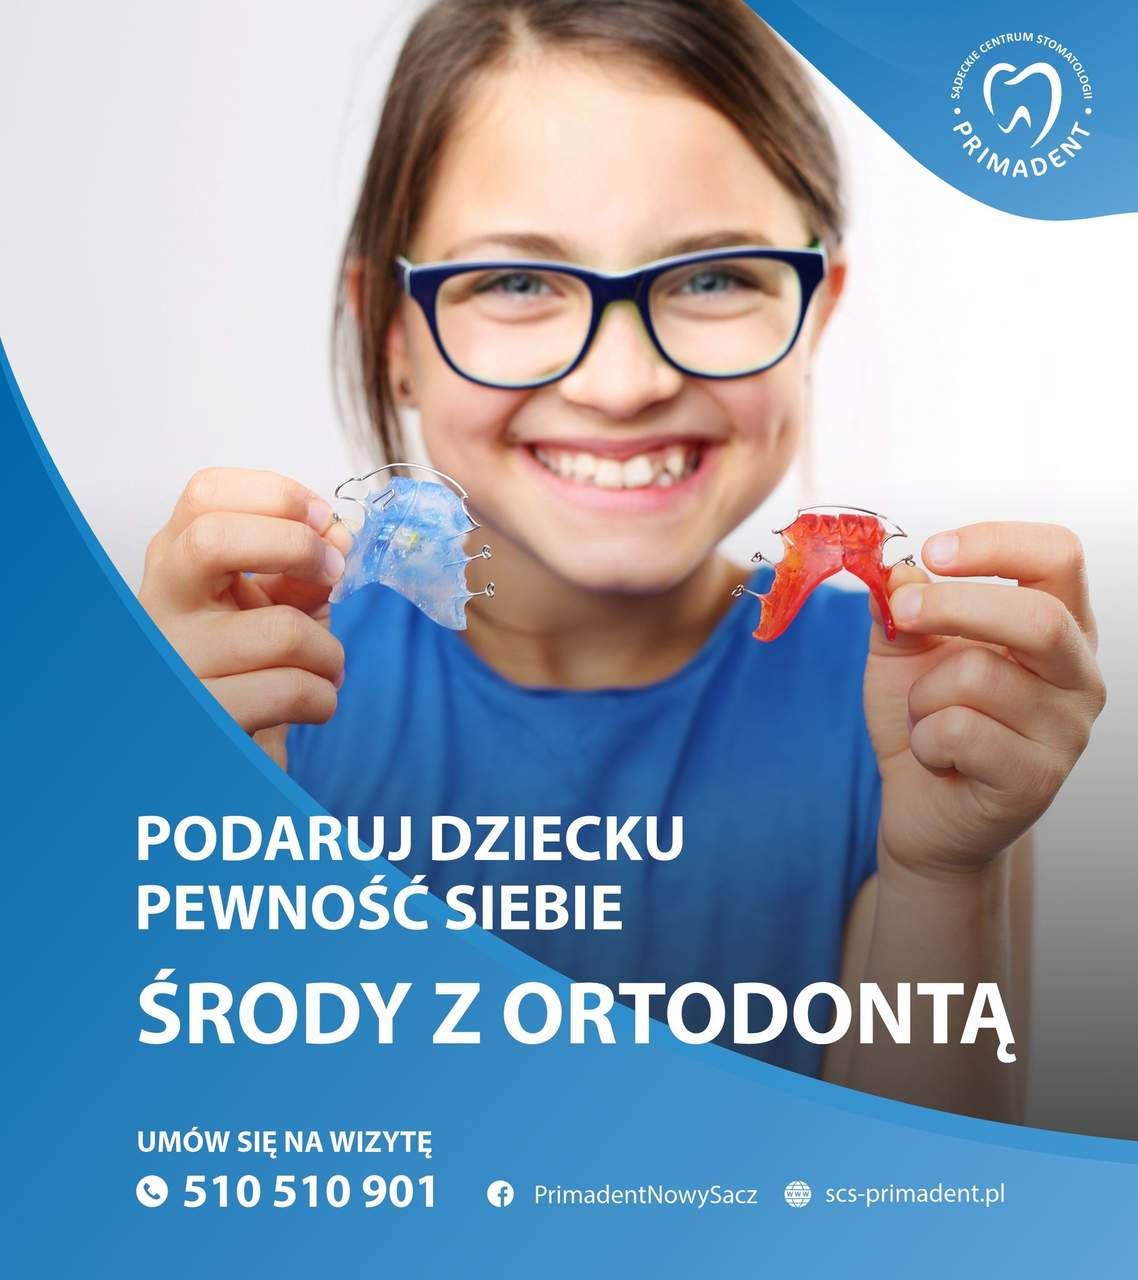 ortodonta primadent